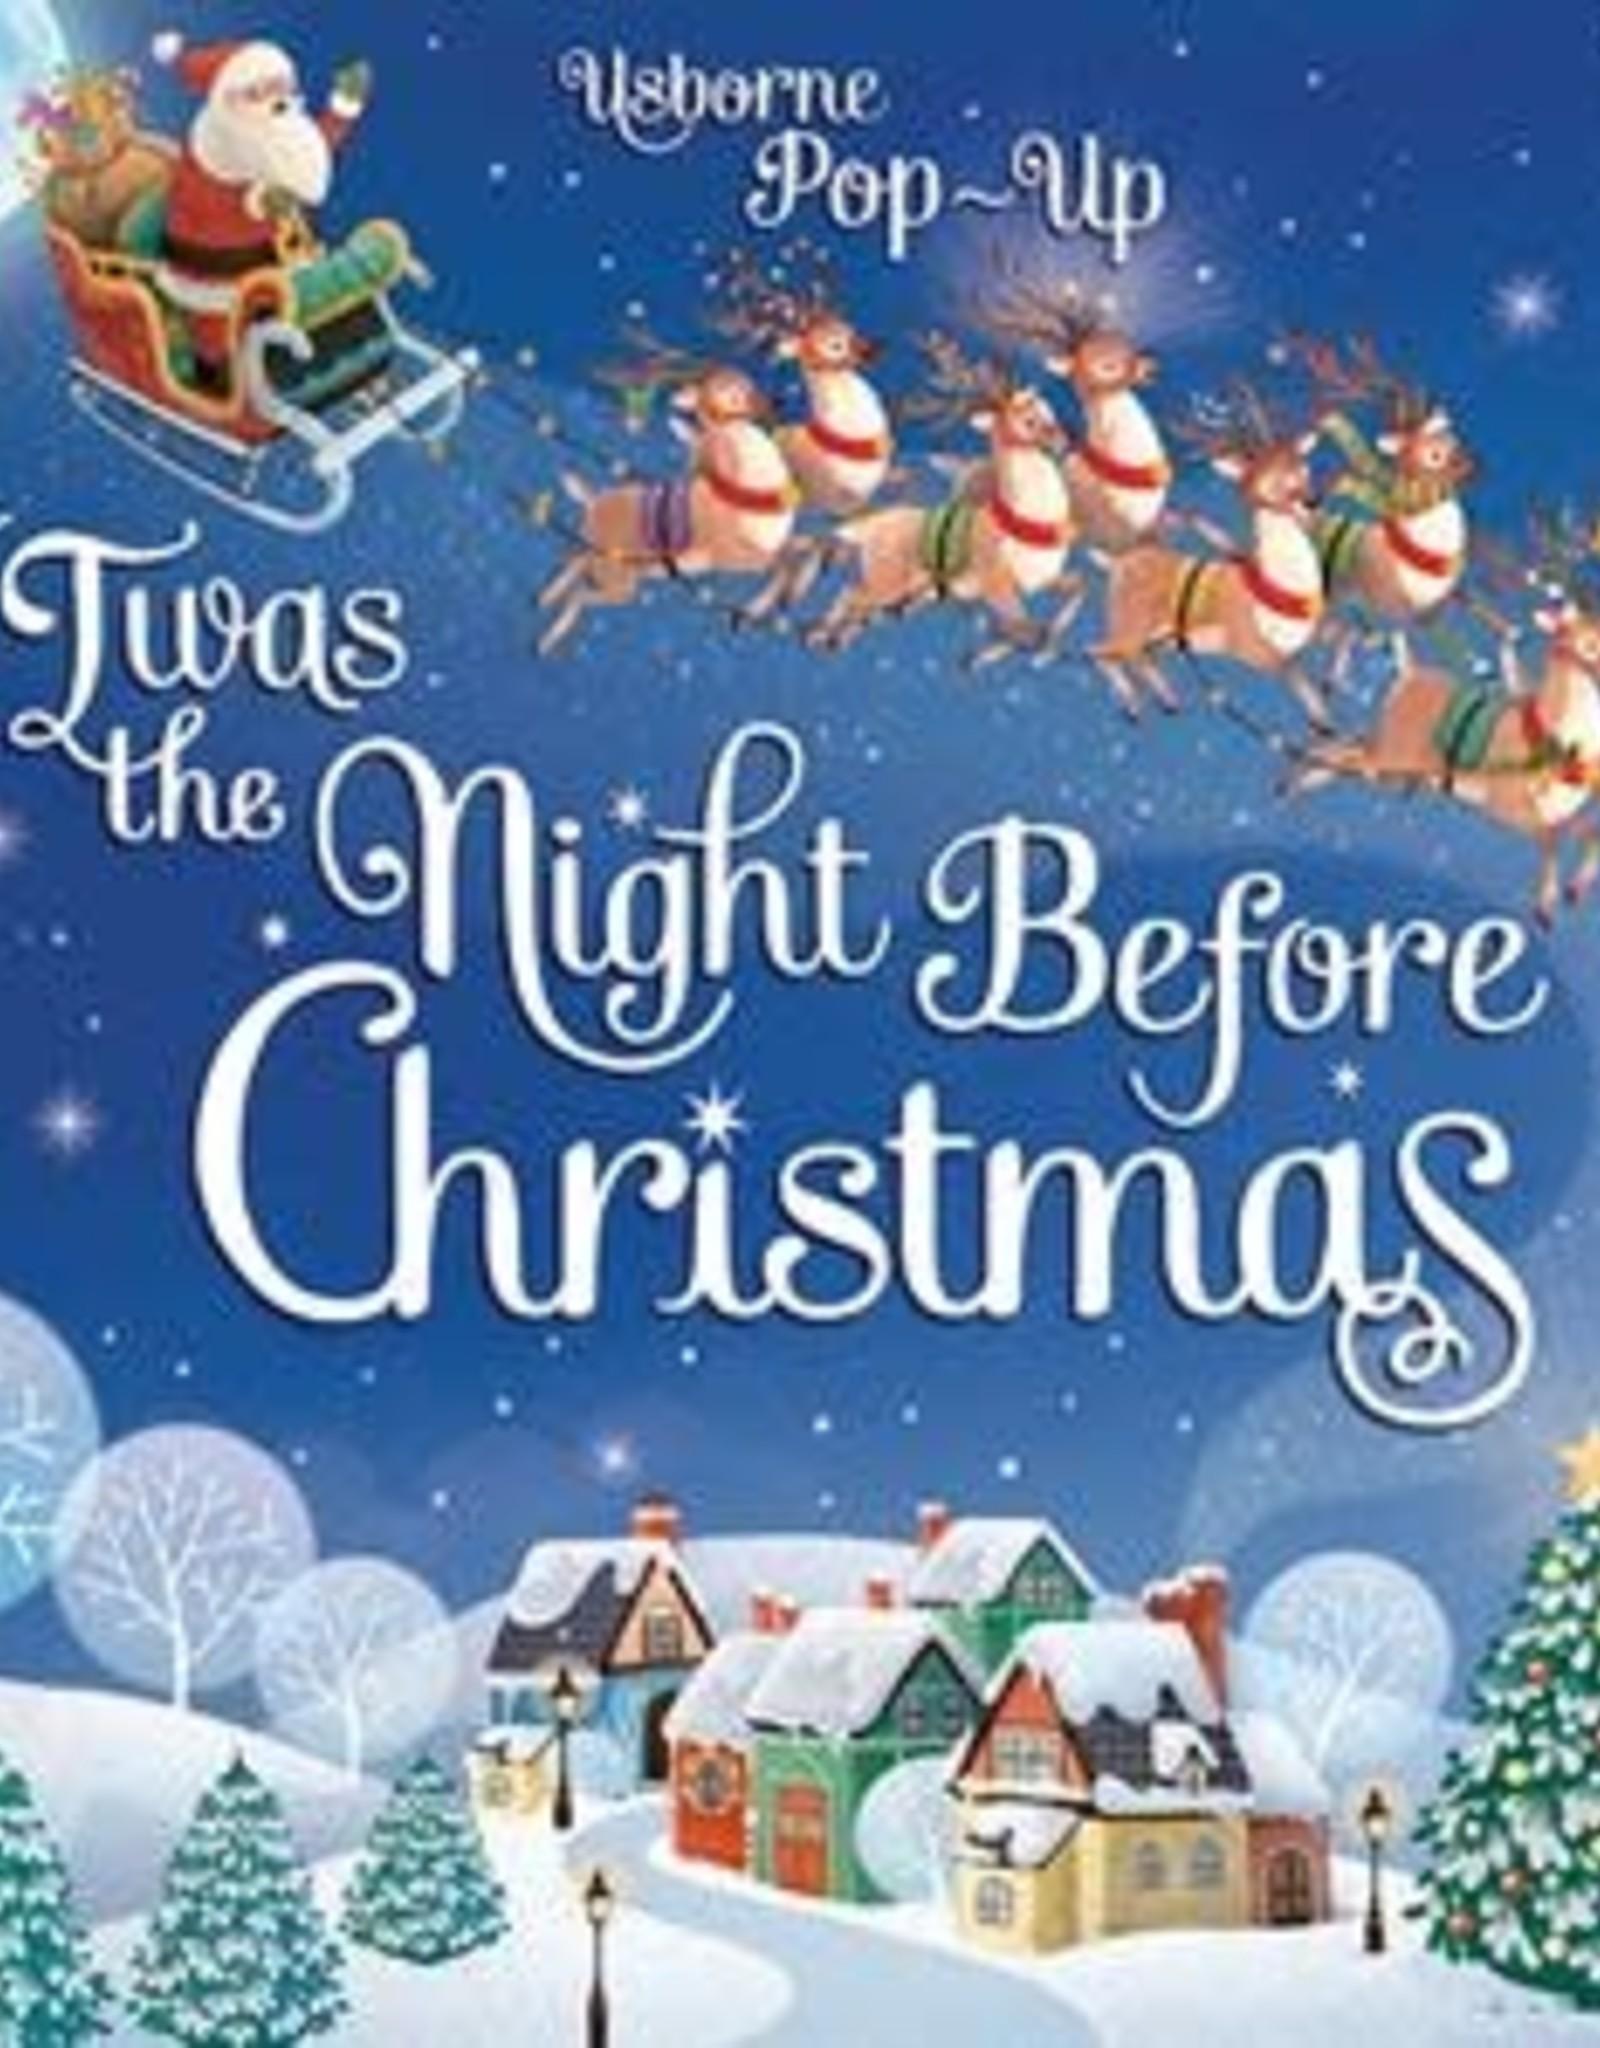 Usborne Pop-Up 'Twas the Night Before Christmas